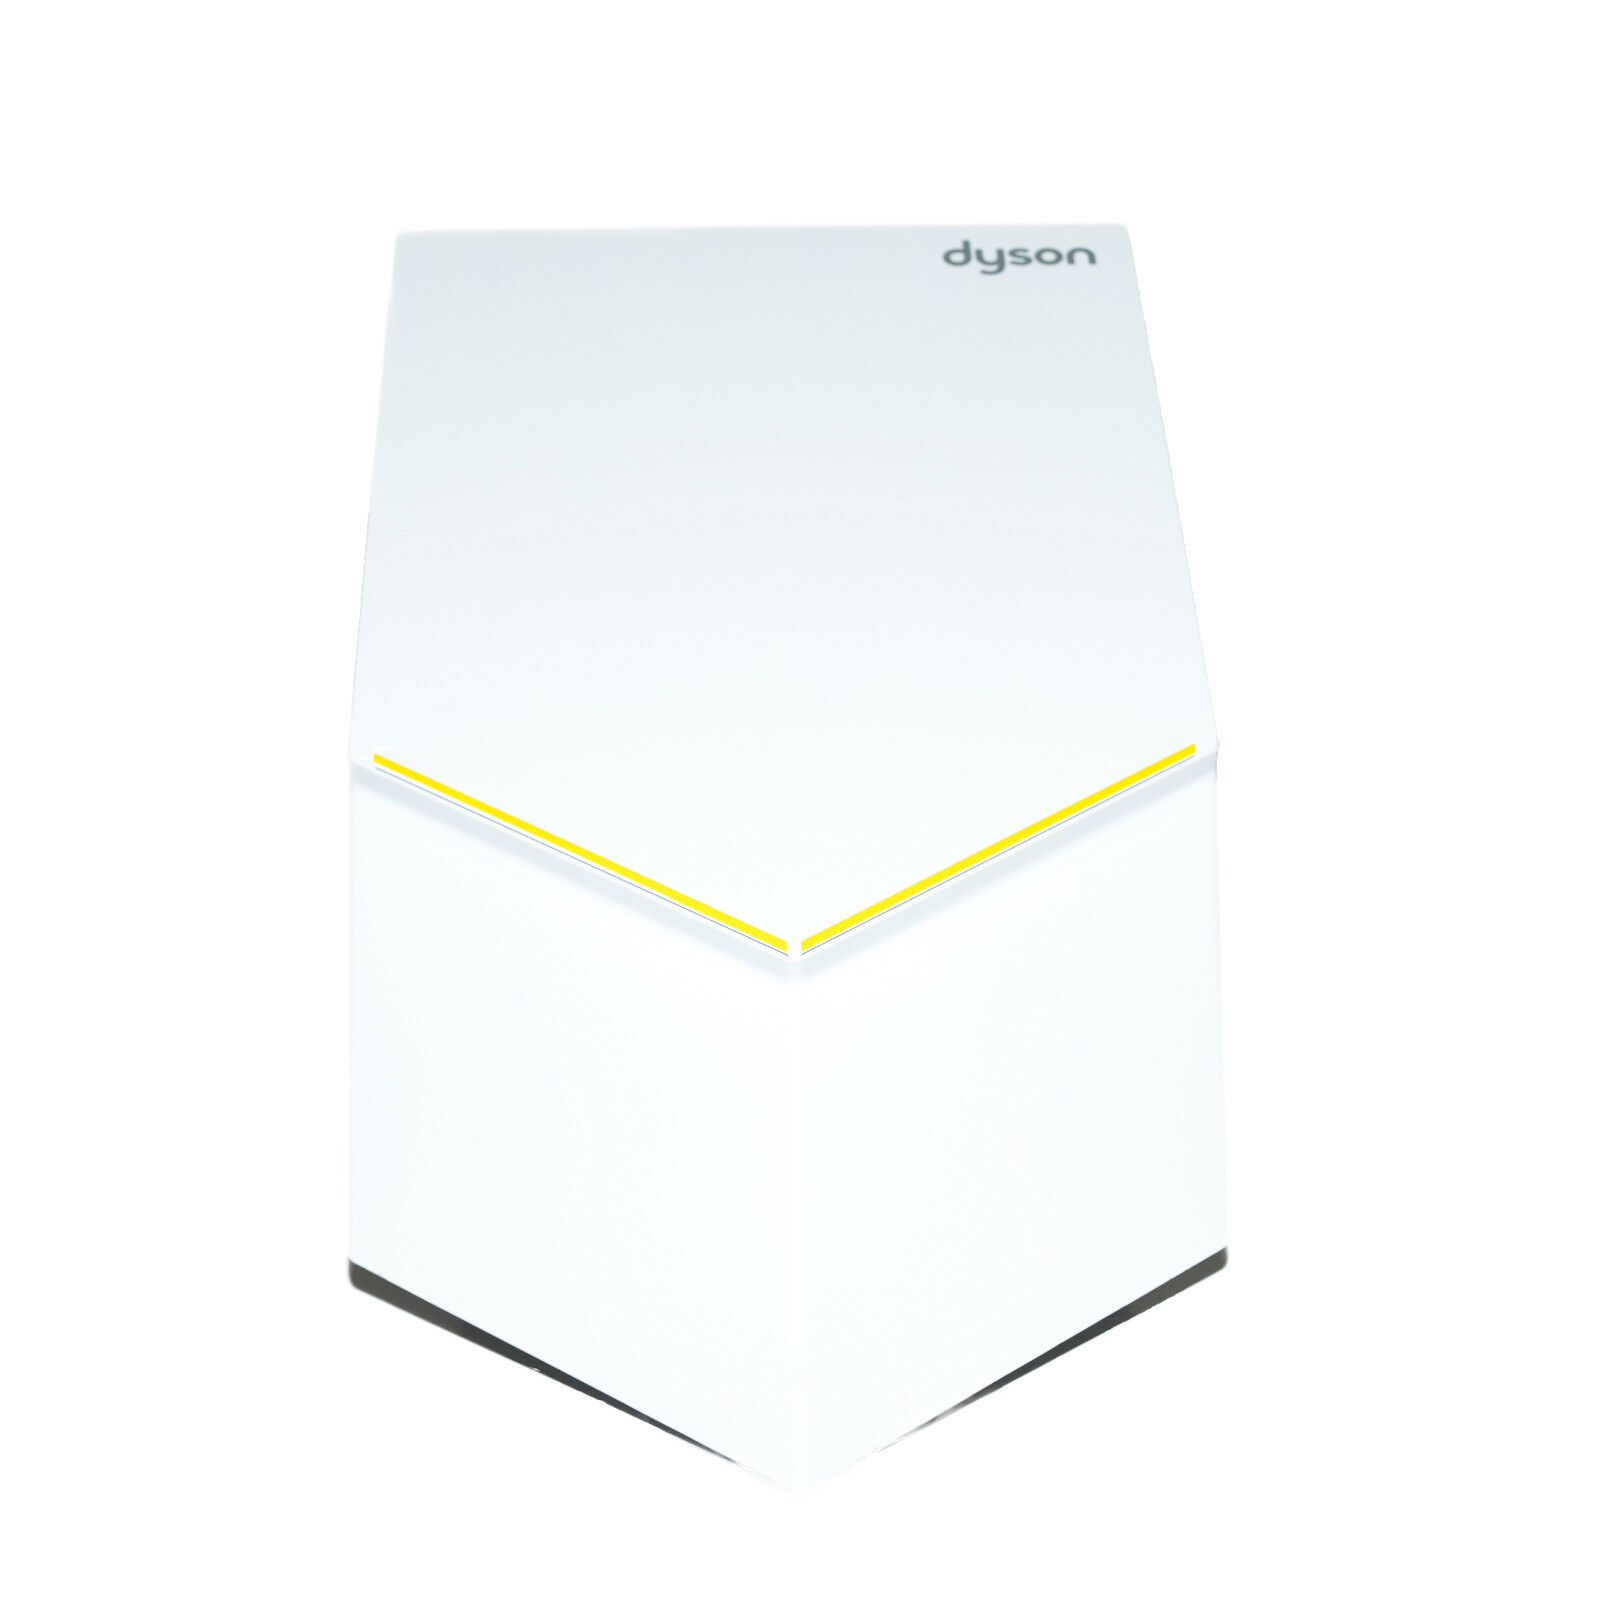 Dyson airblade ab03 цена насадки для пылесосов dyson dc23